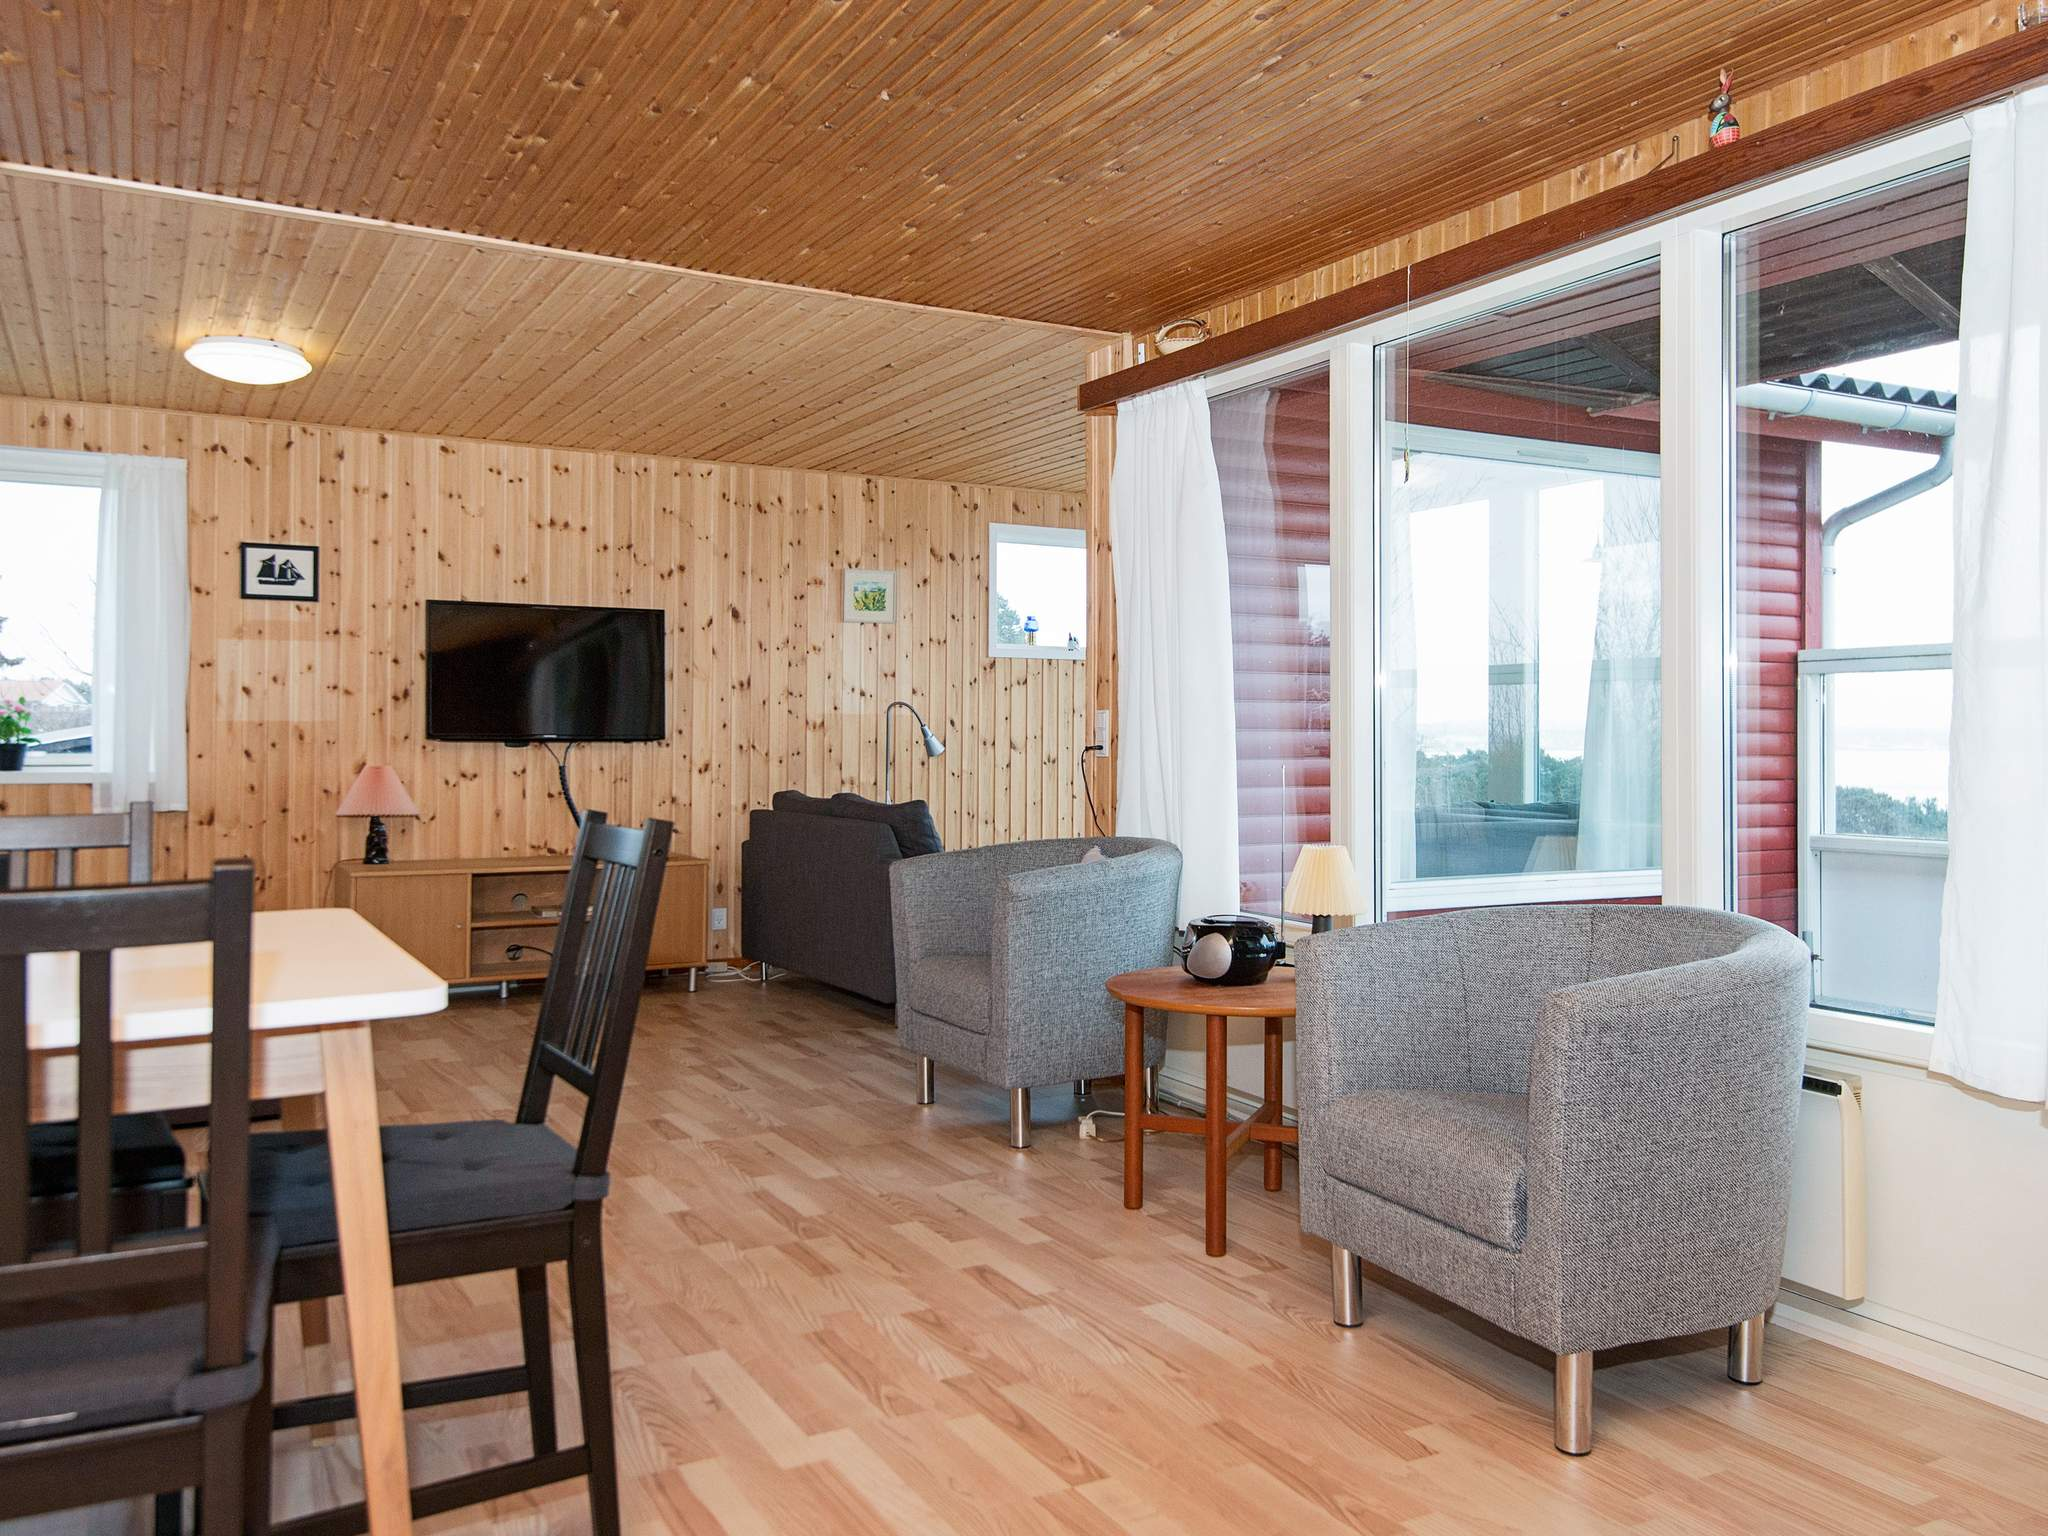 Ferienhaus Egsmark Strand (2390539), Egsmark, , Ostjütland, Dänemark, Bild 8